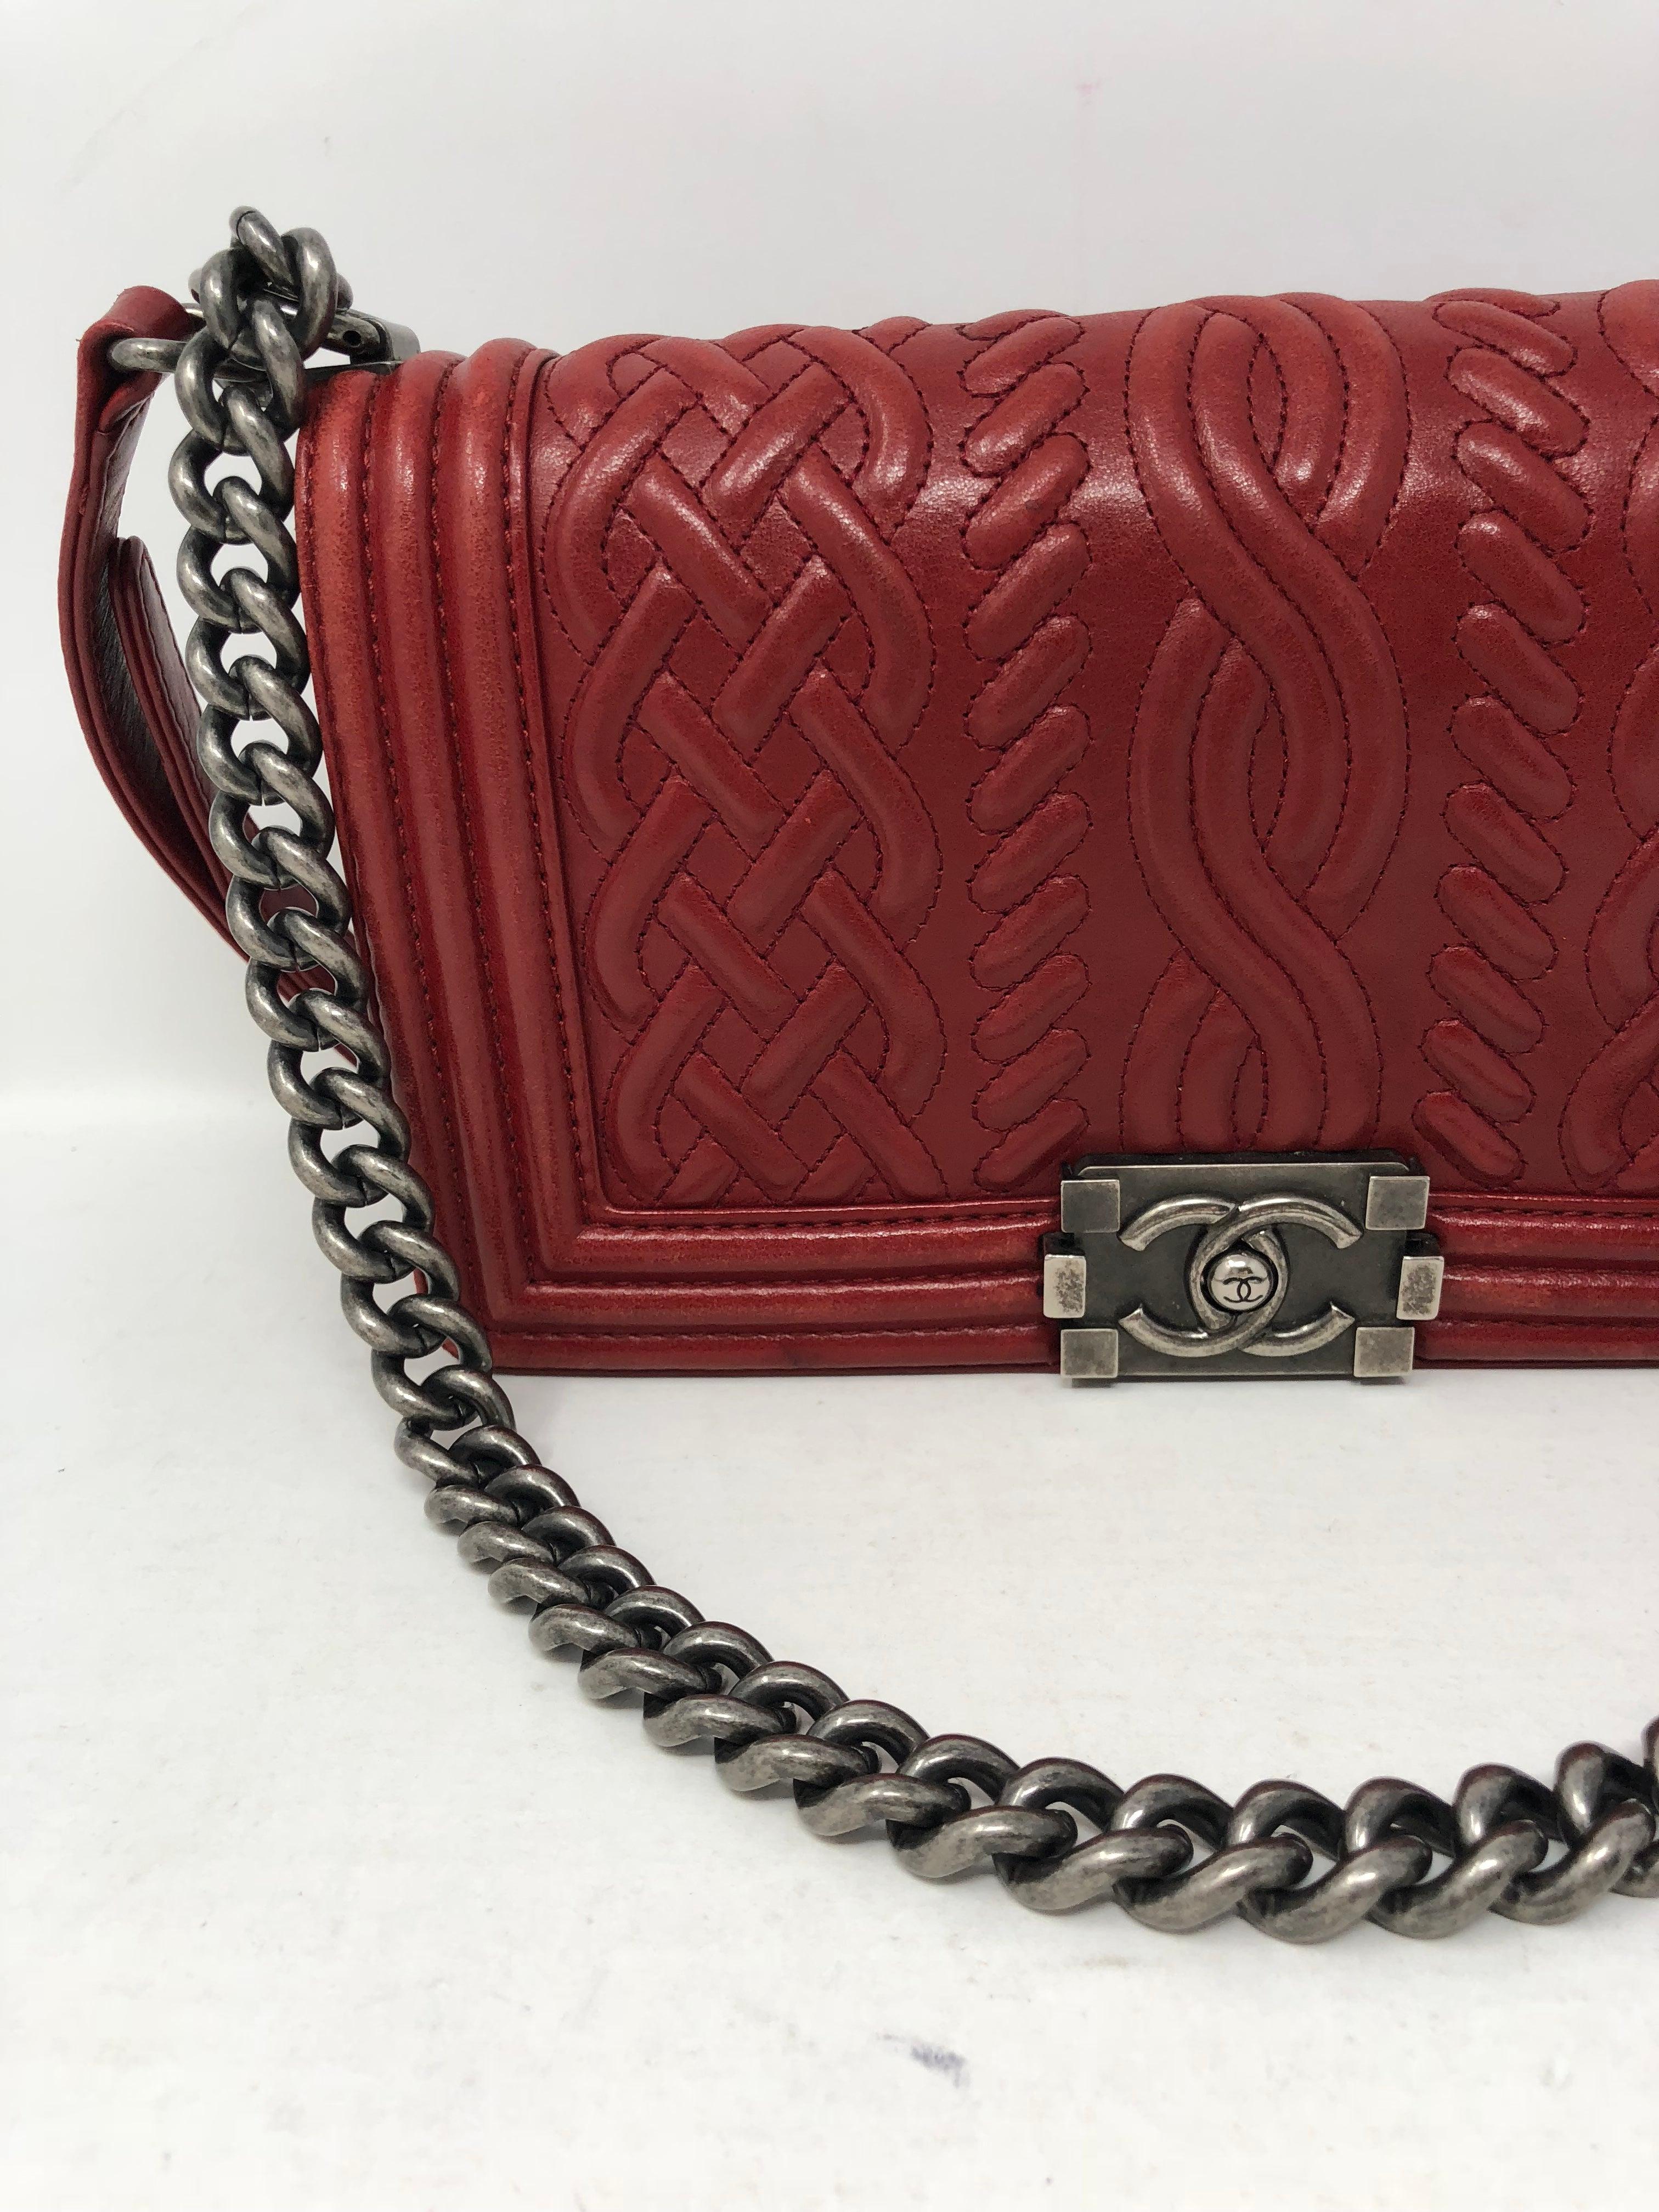 6afda37efb24 Red Chanel Limited Edition Boy Bag at 1stdibs